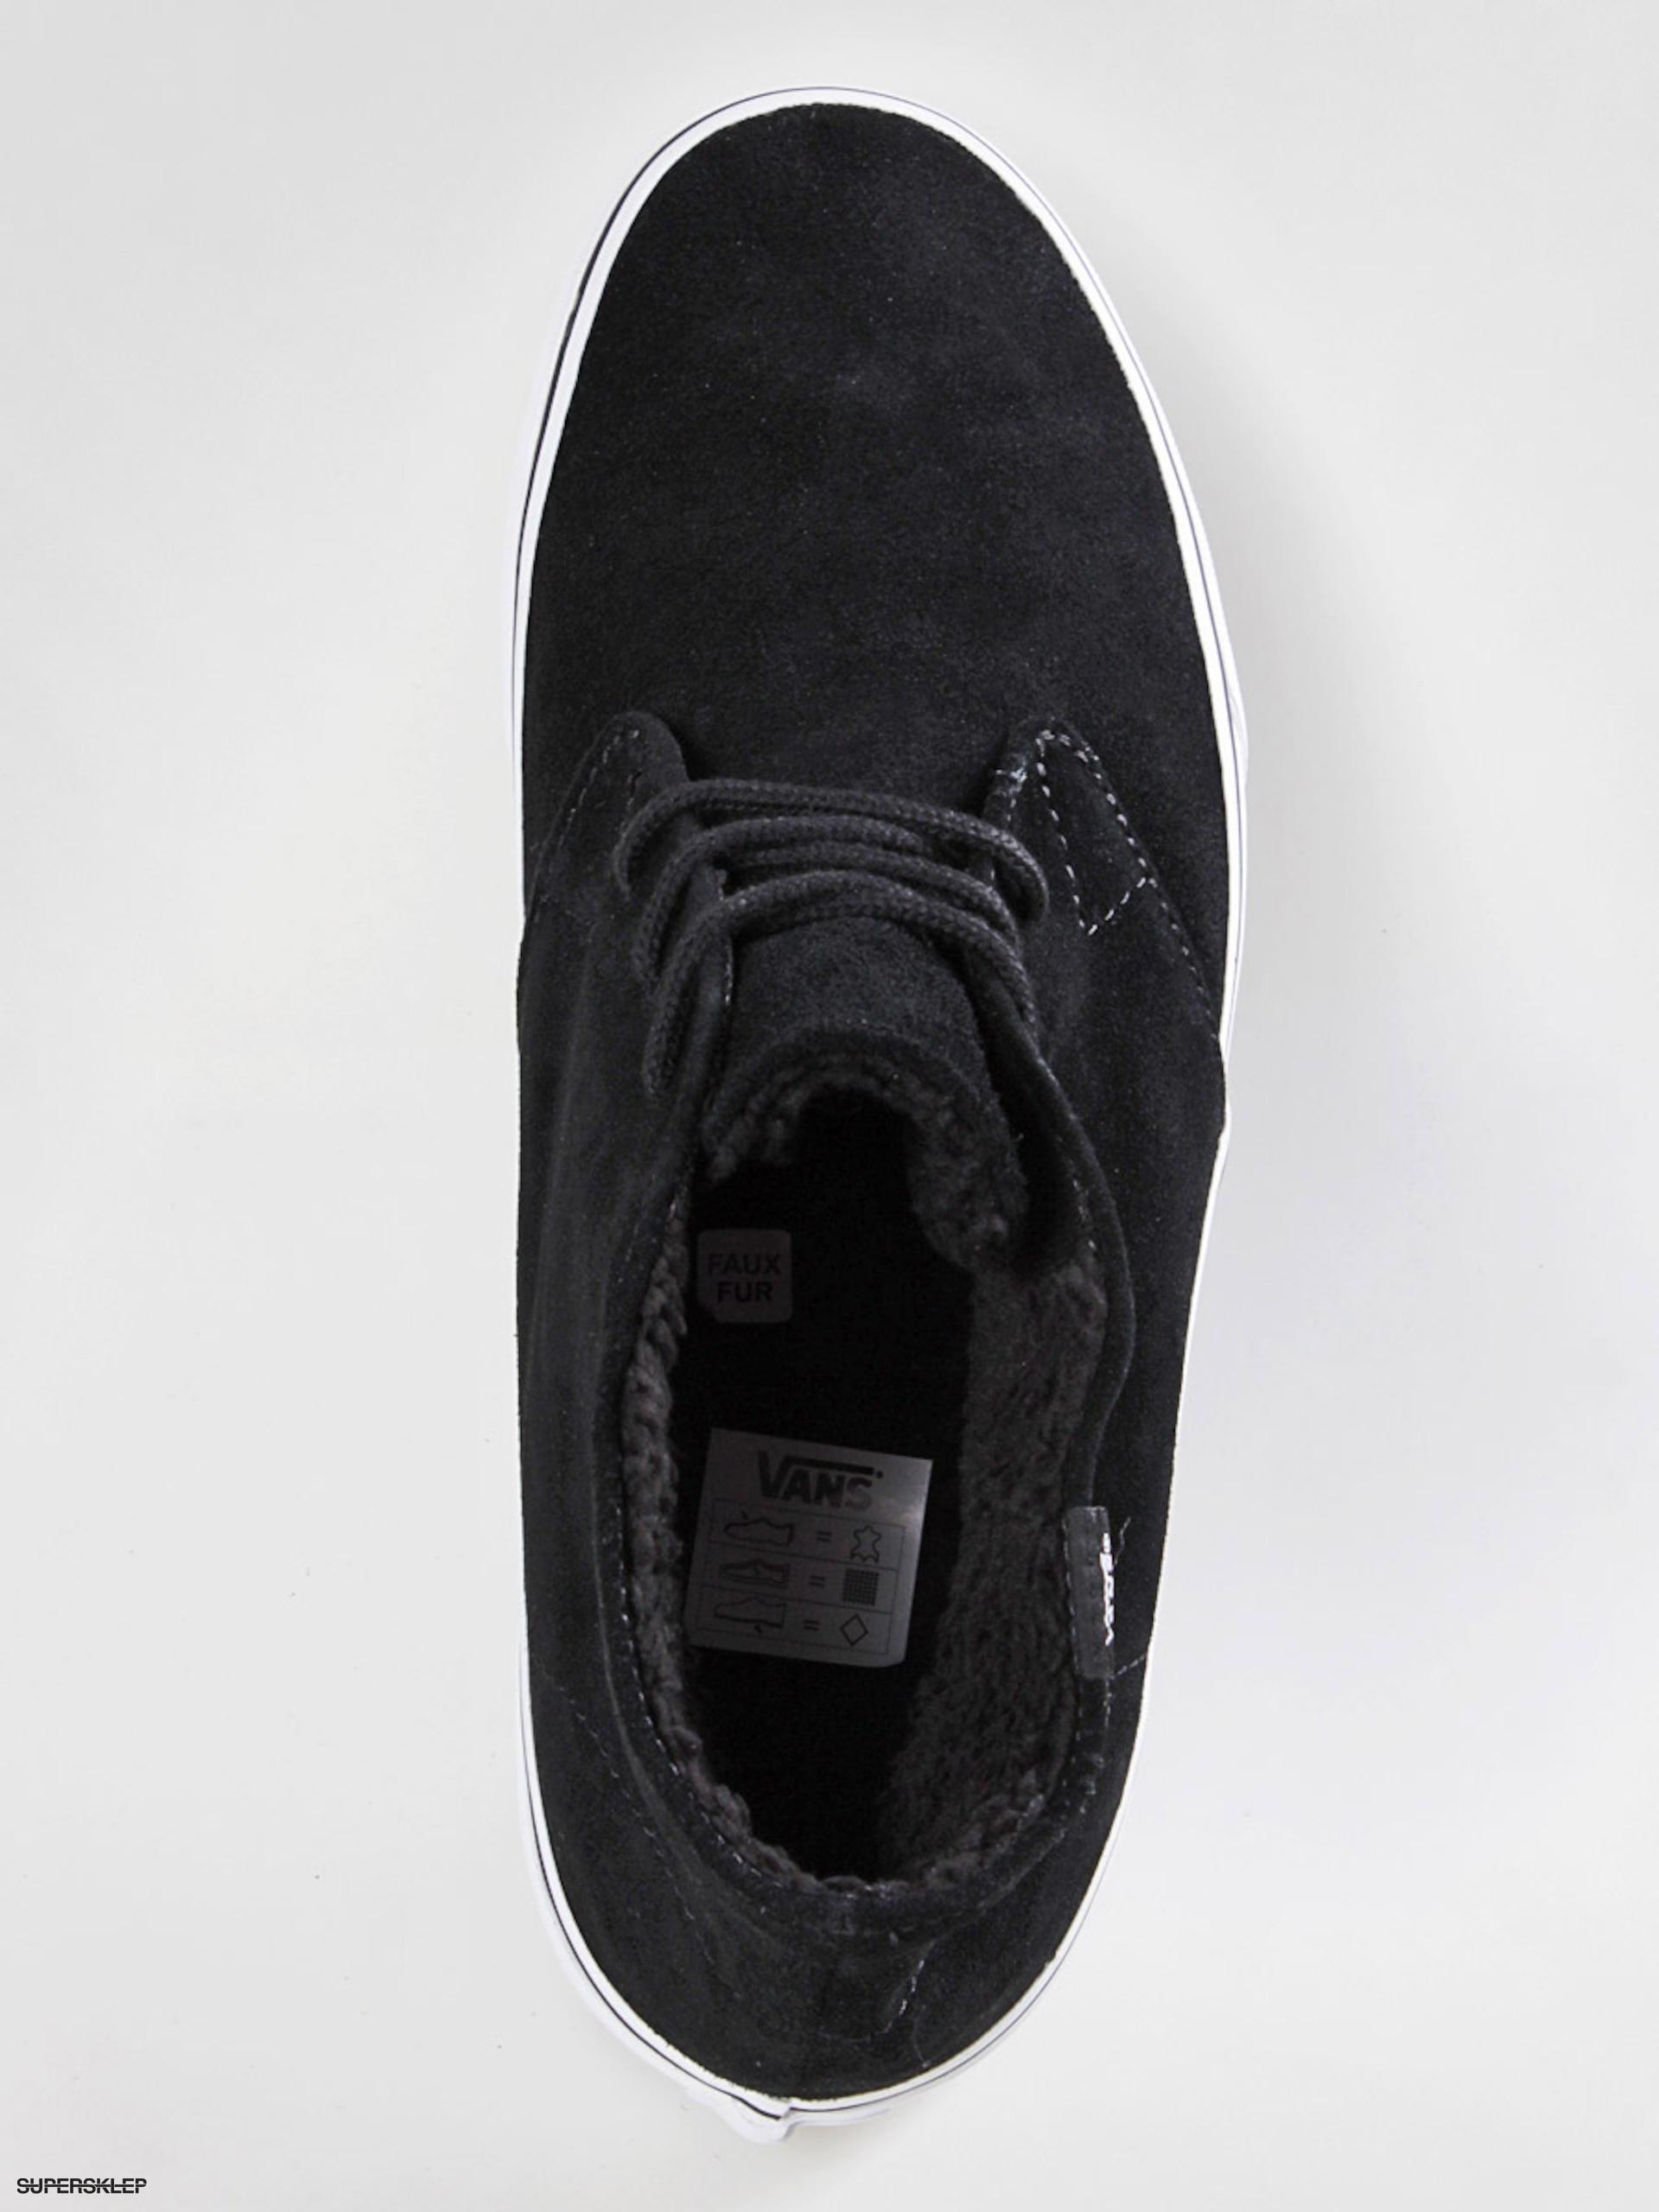 0d904aadd7 Buty Vans Chukka Decon (fleece lining black)